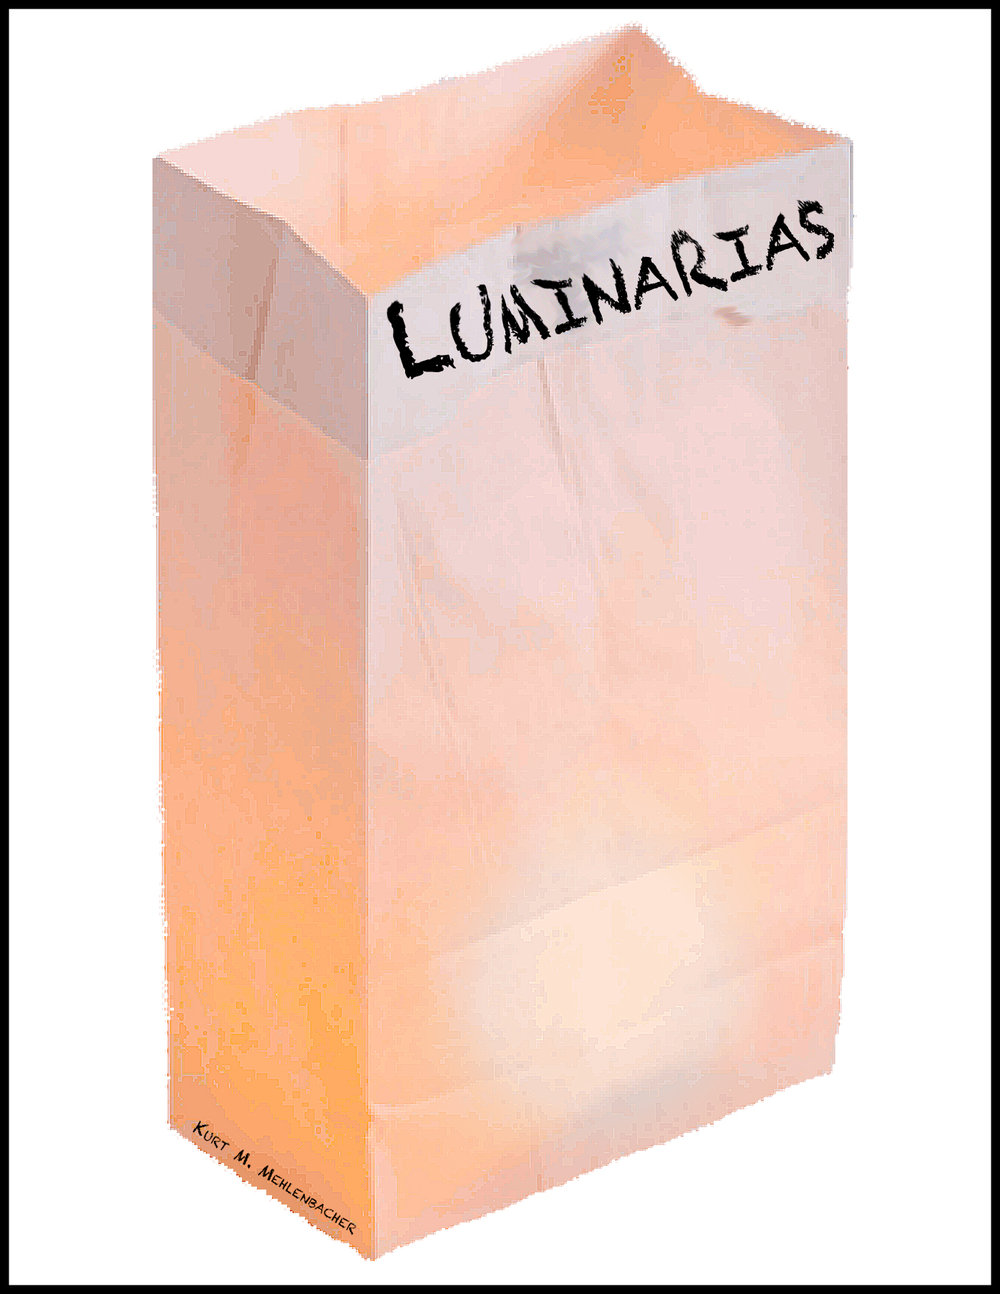 Luminarias    for brass quartet (2 C trumpets, horn, tuba) and organ